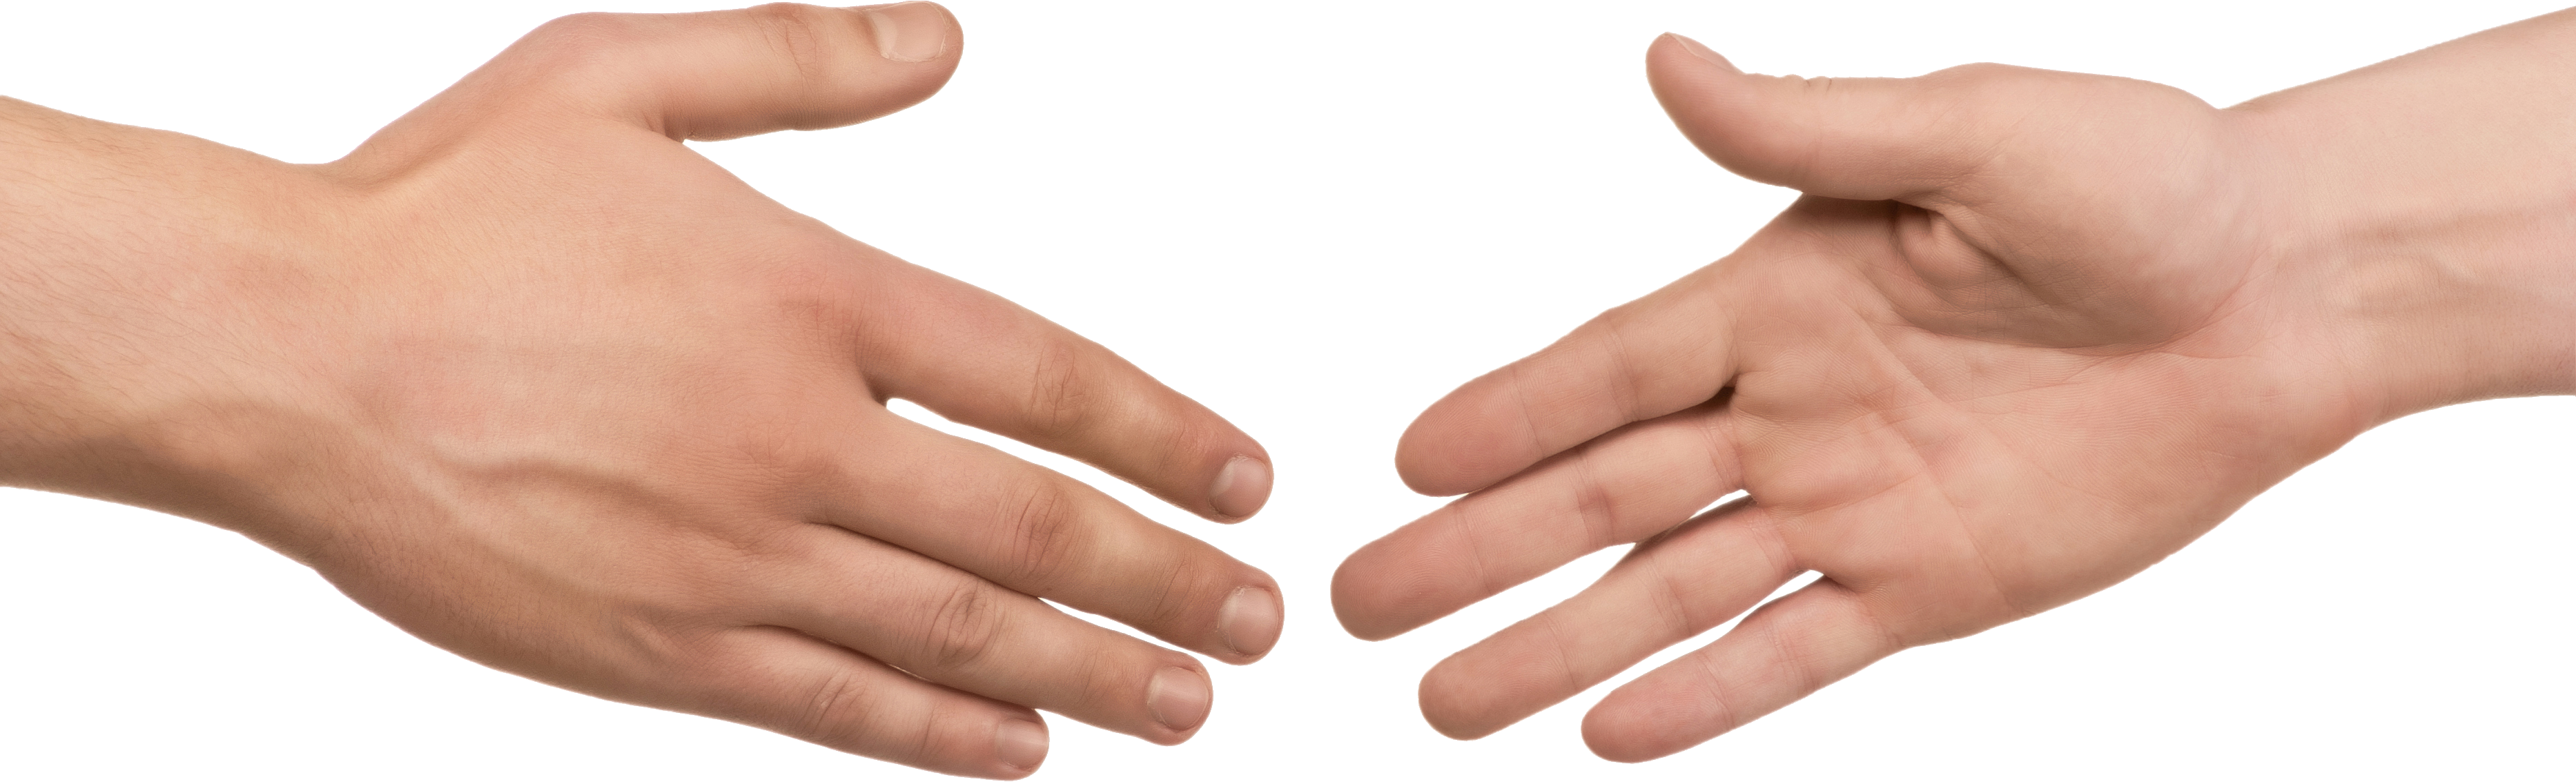 Handshake PNG HD-PlusPNG.com-3732 - Handshake PNG HD